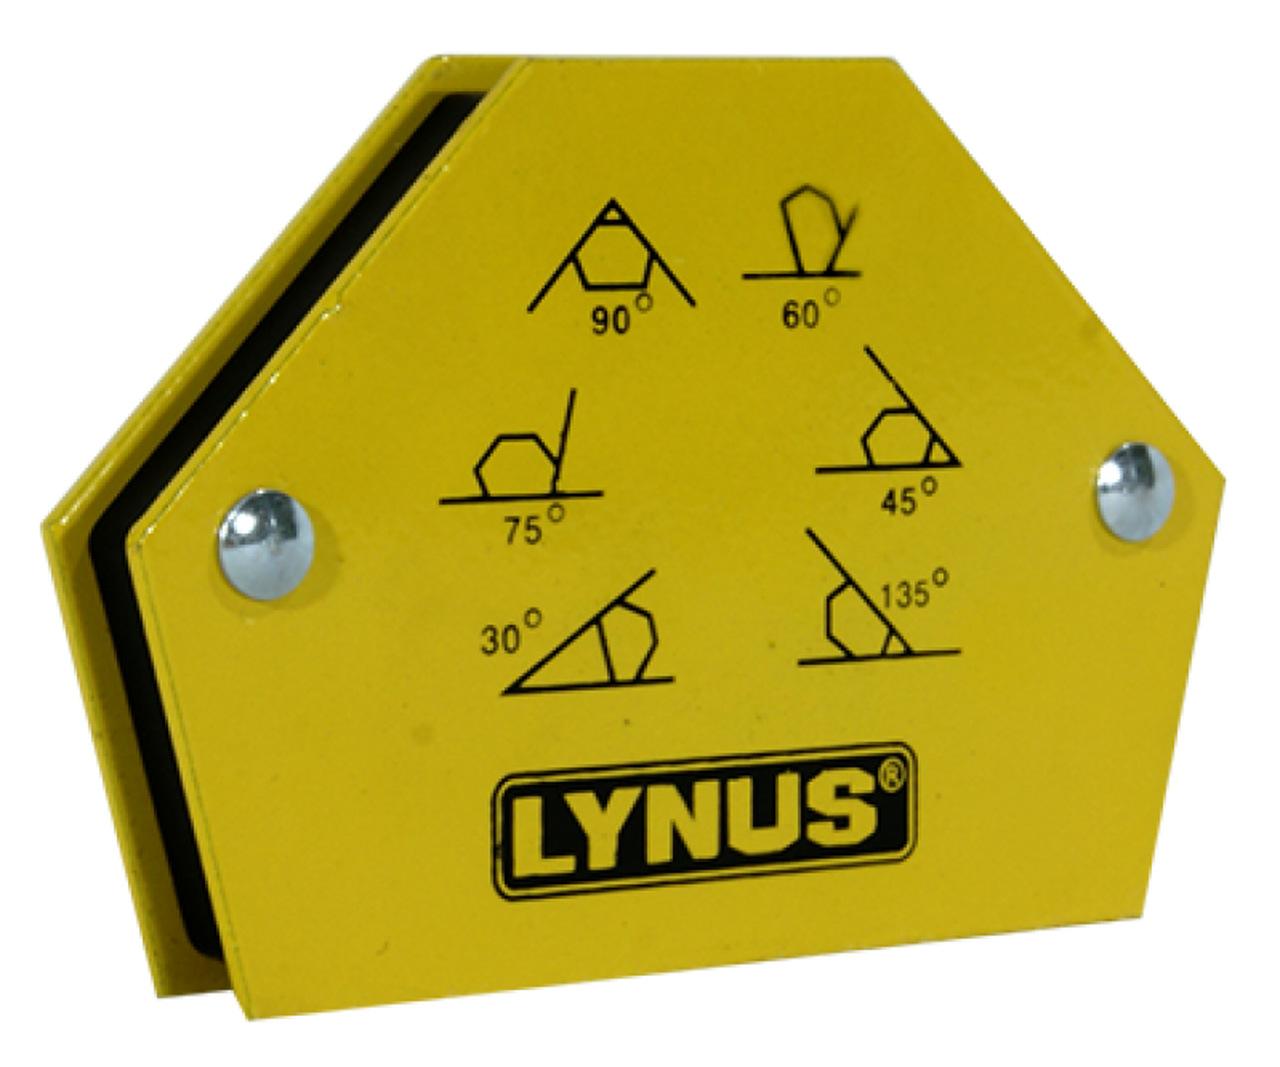 Esquadro magnético 12kg Lynus 10818.6 Eml-12a